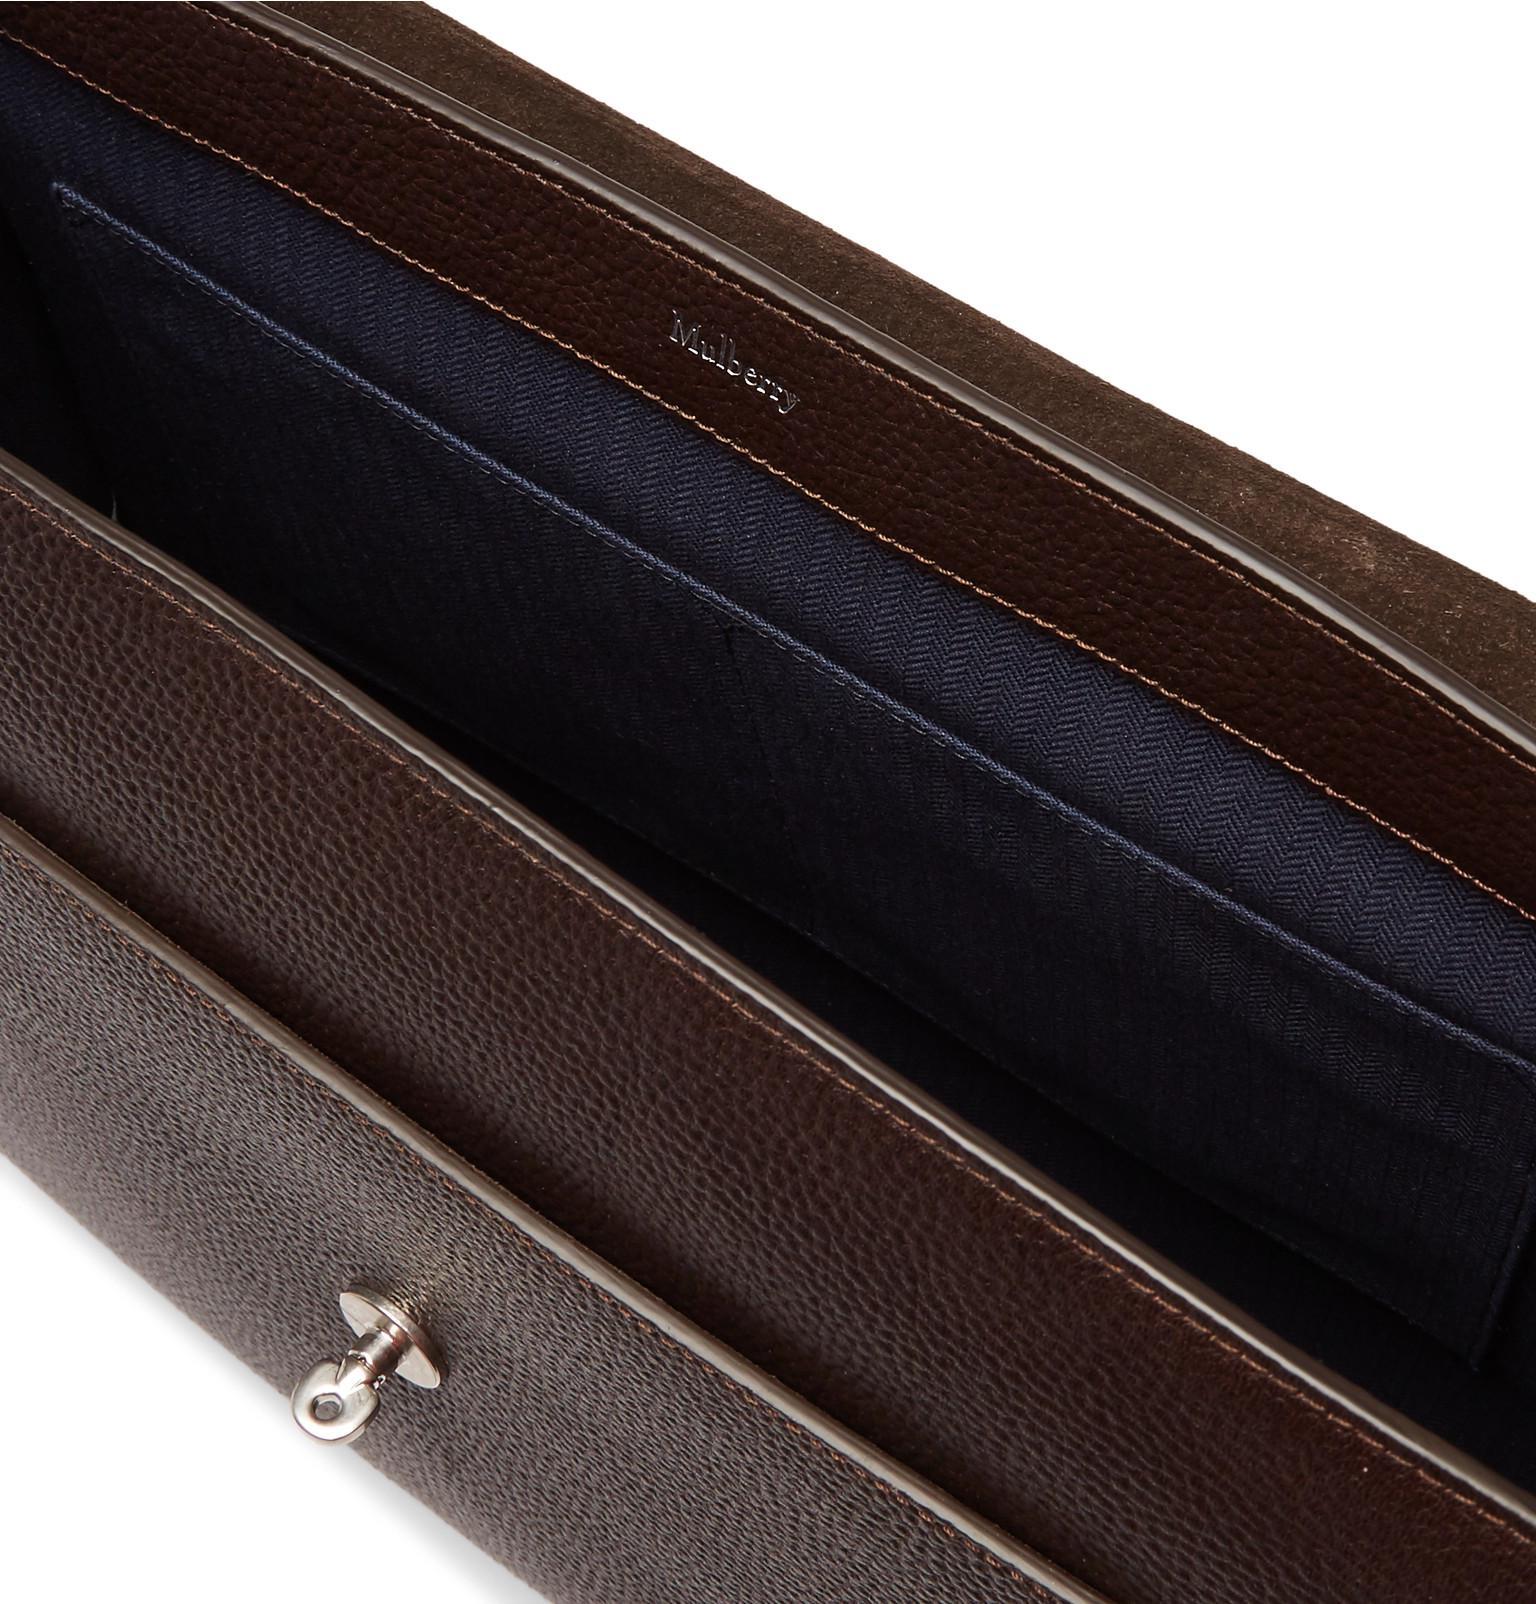 Mulberry - Brown East West Antony Padlock Pebble-grain Leather Messenger Bag  for Men -. View fullscreen a9474cbf252c4